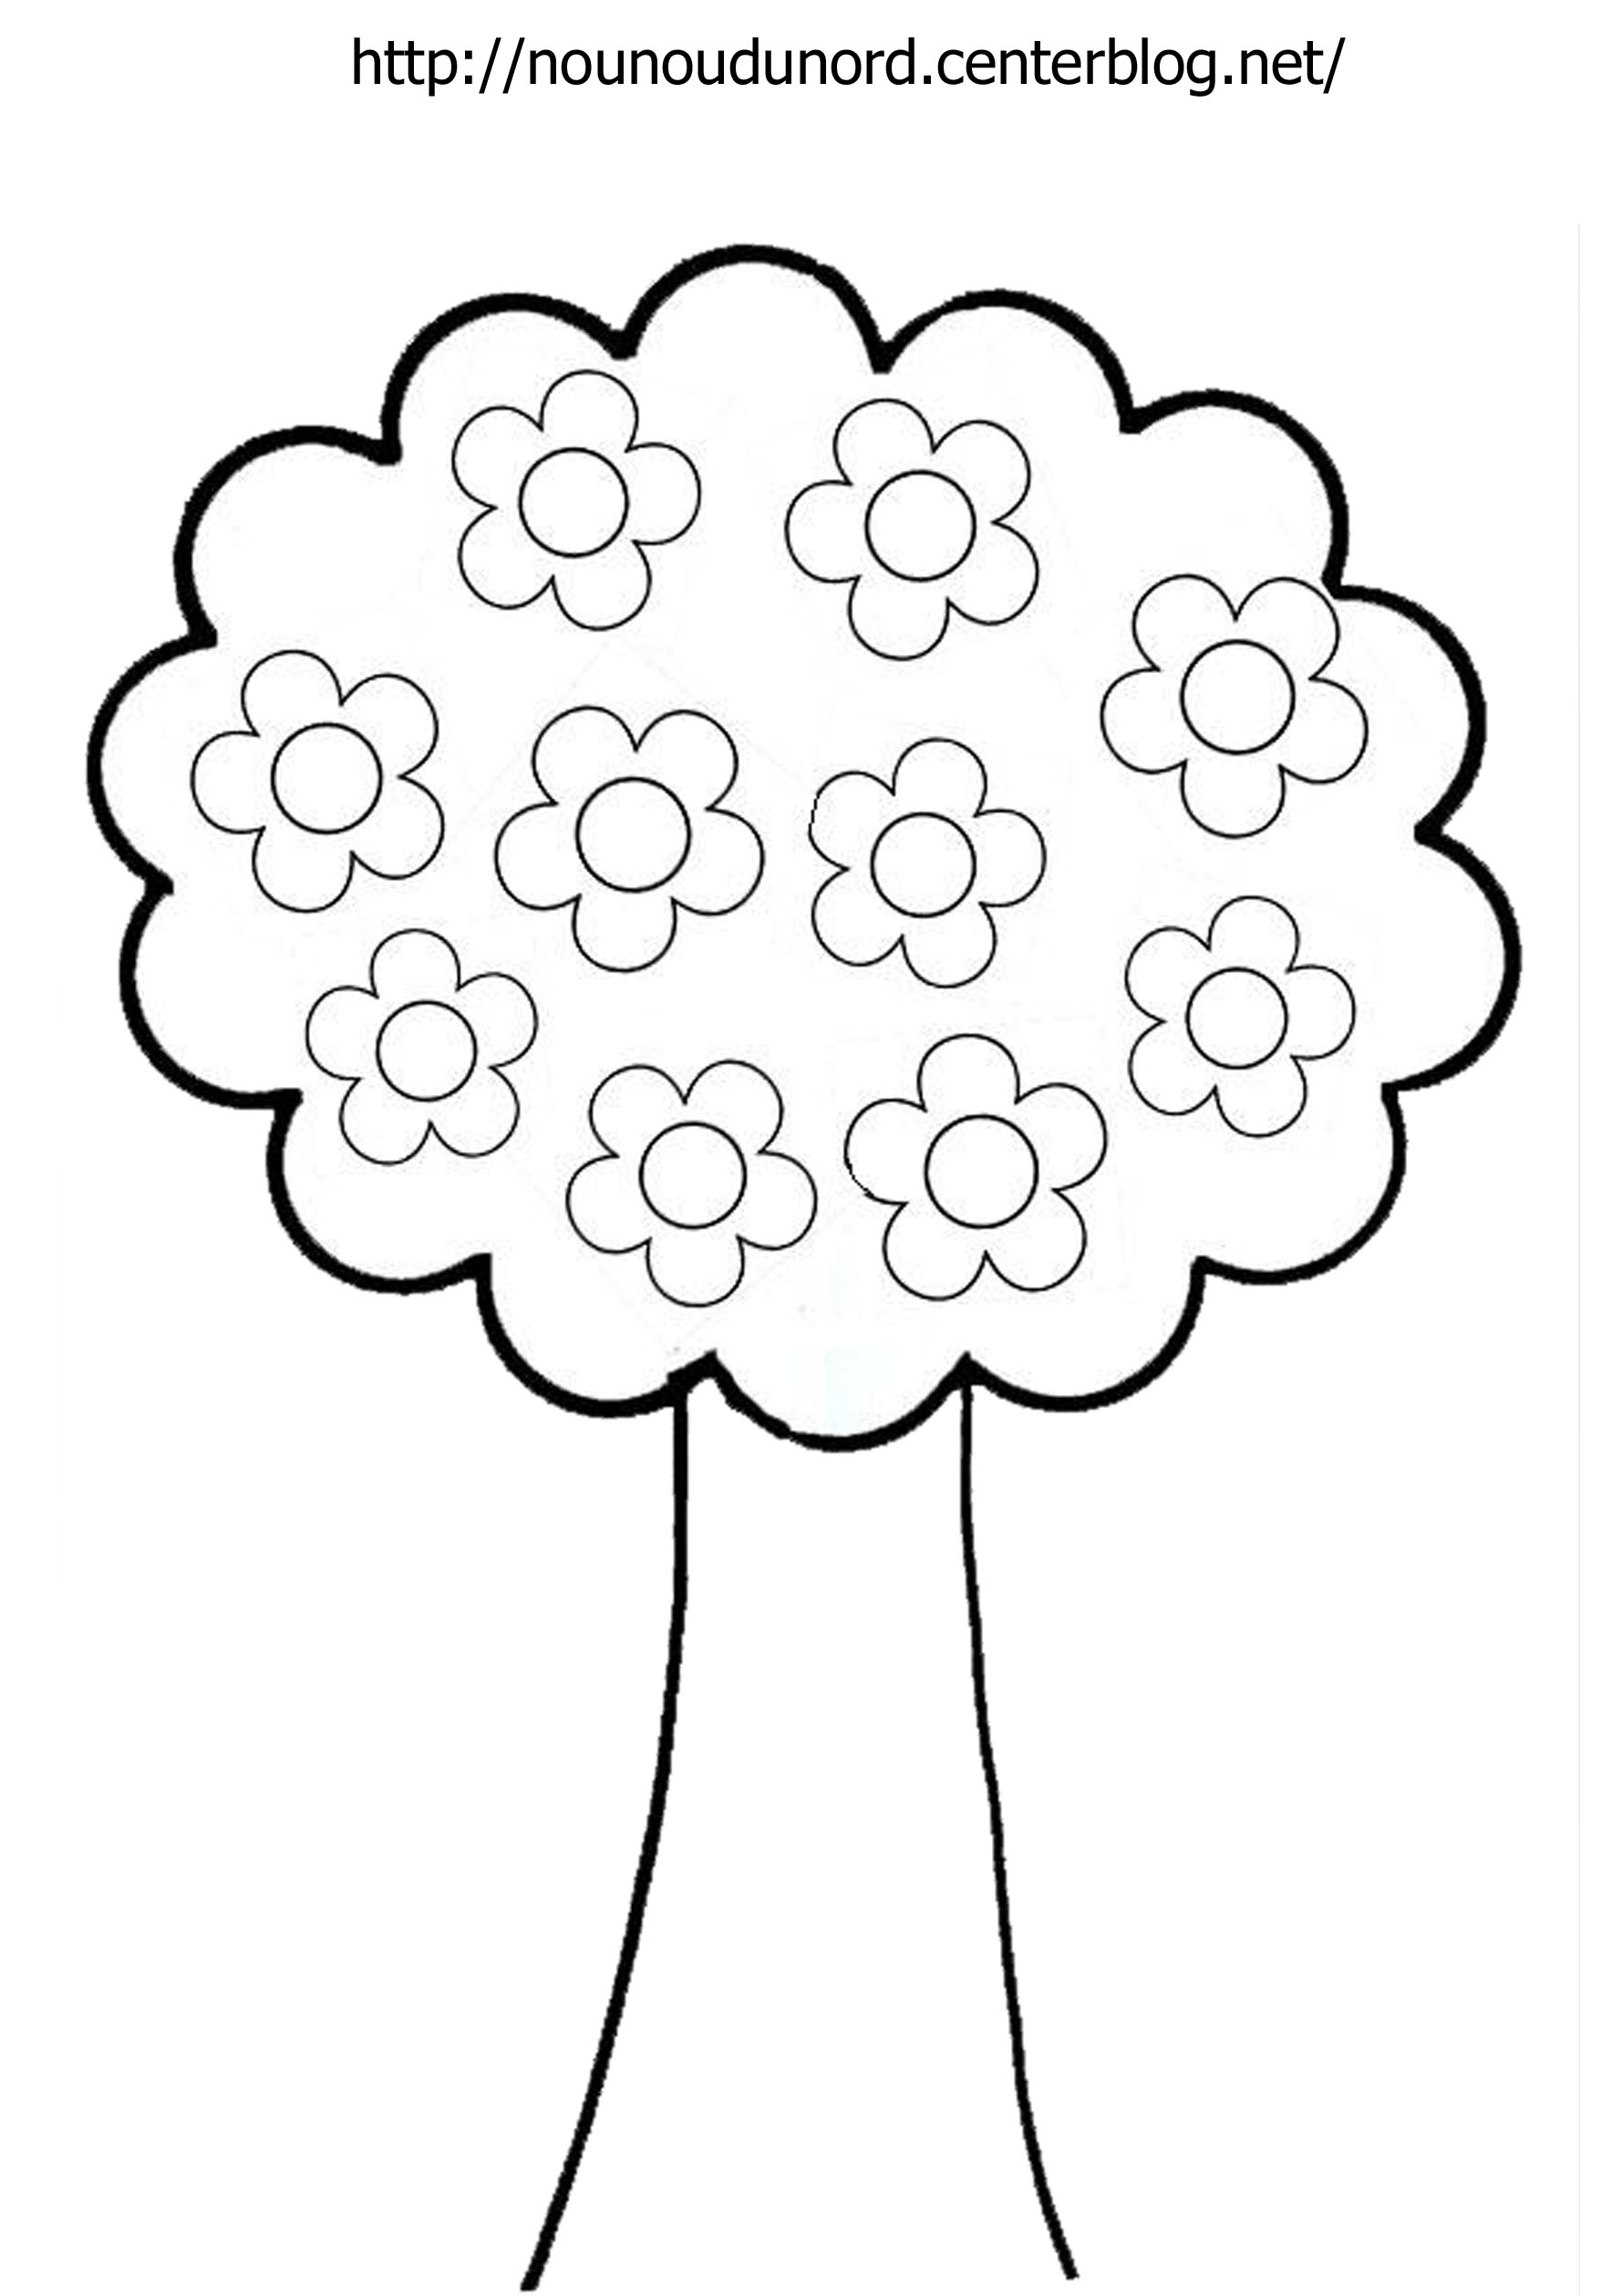 coloriage arbre fleuri dessiné